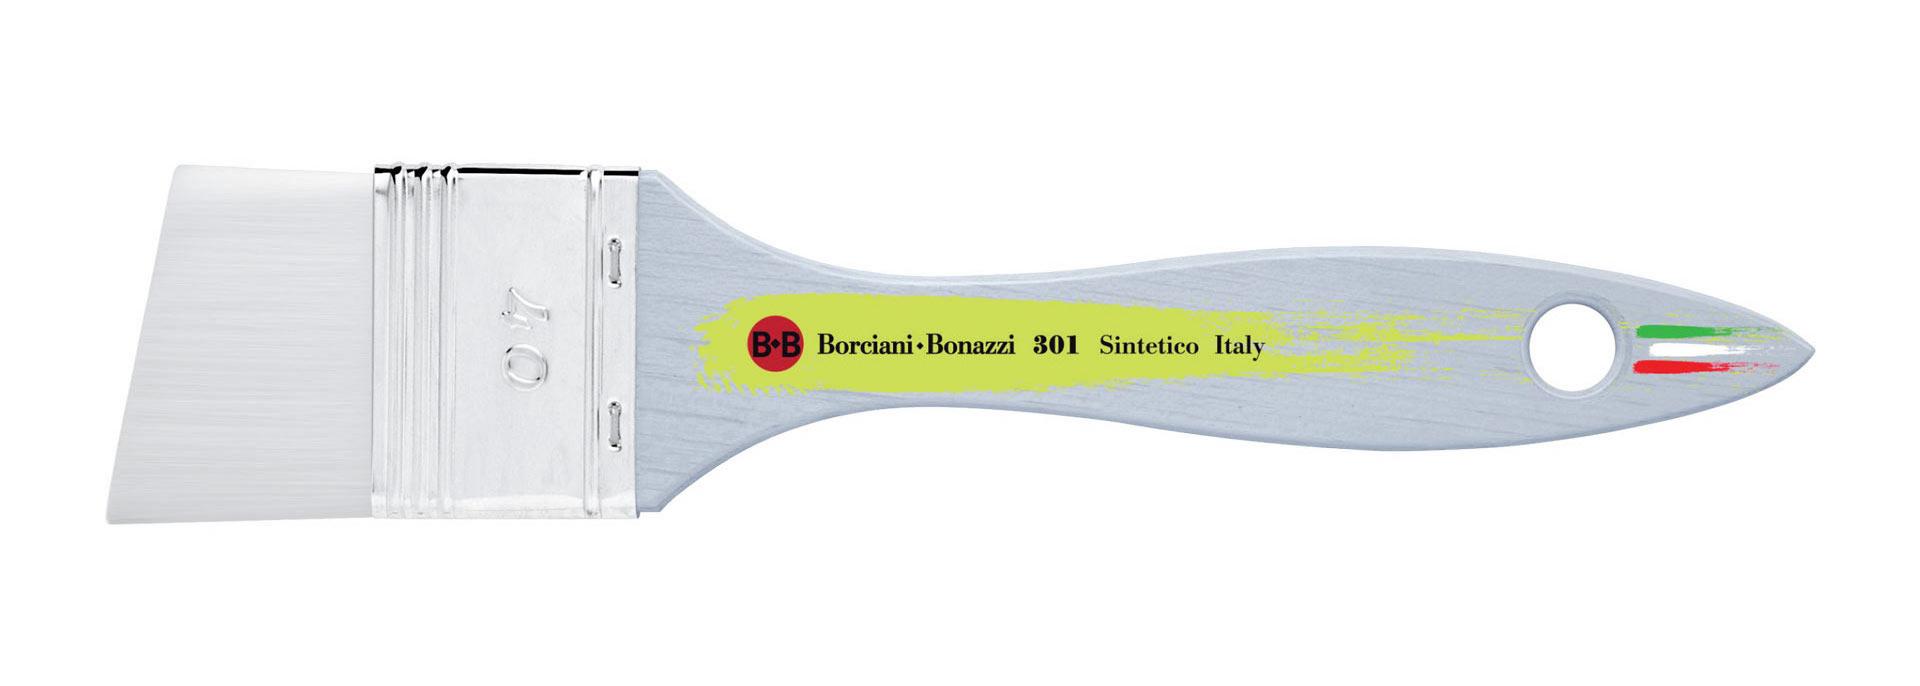 Borciani e Bonazzi 301 series